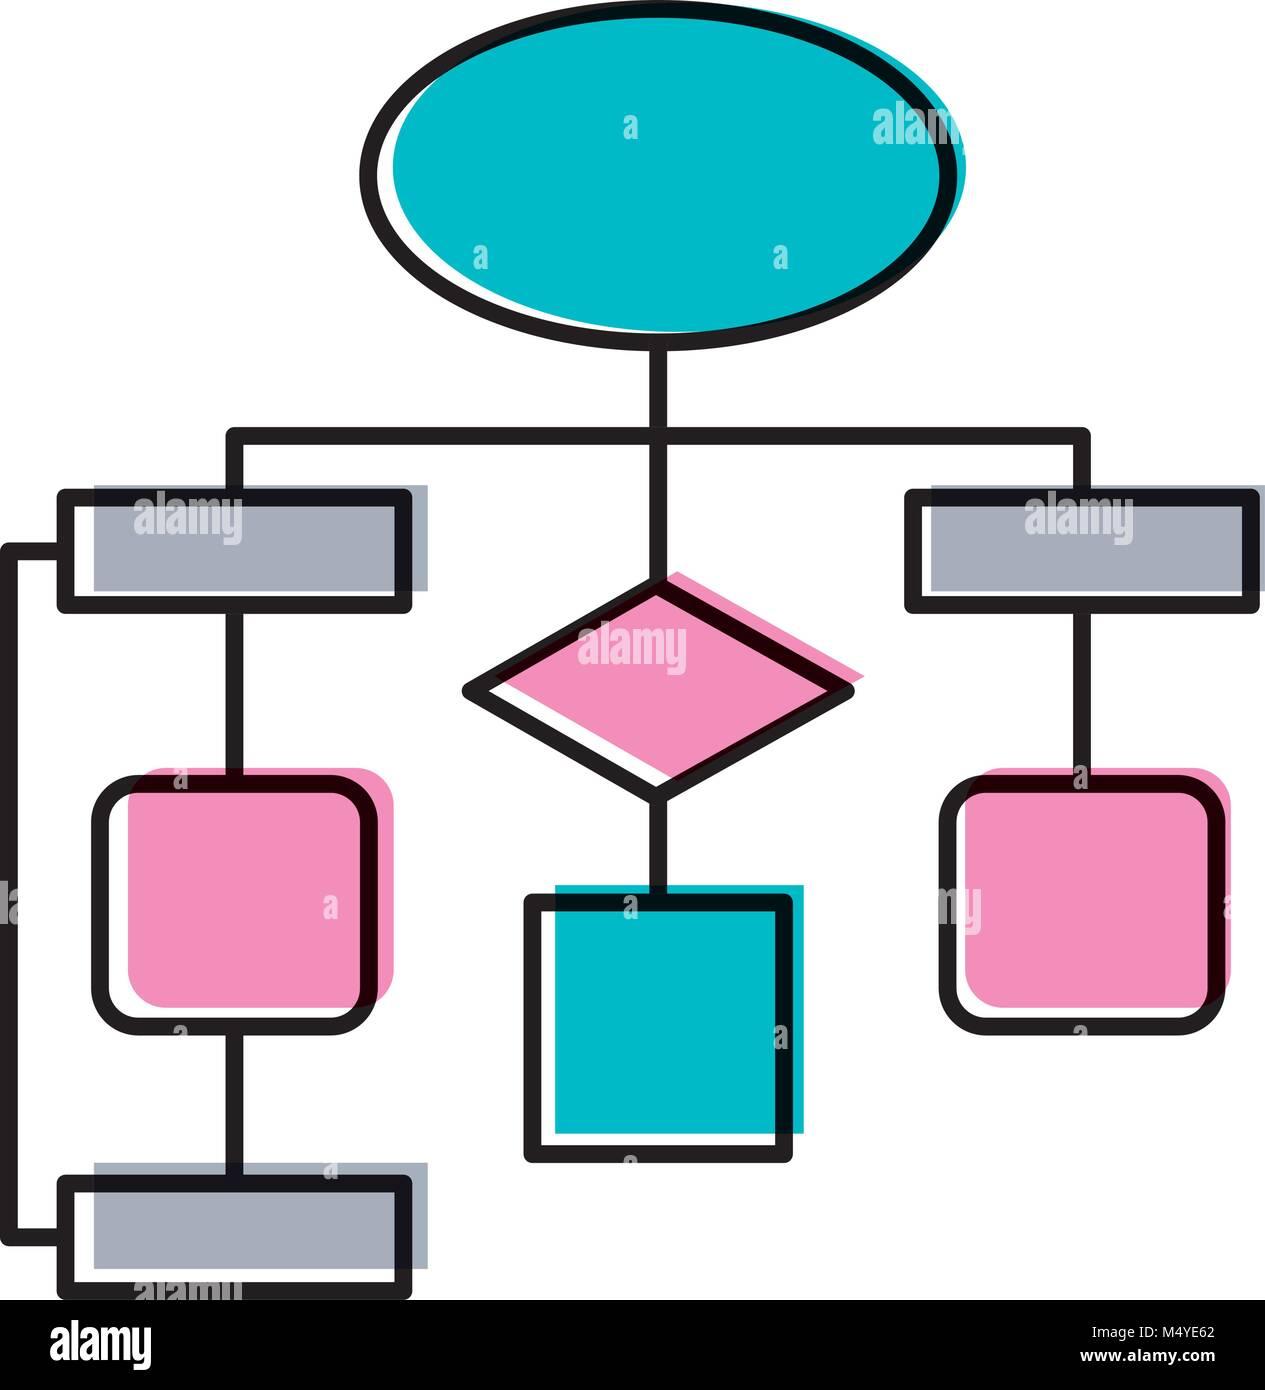 diagram flow chart connection empty - Stock Image